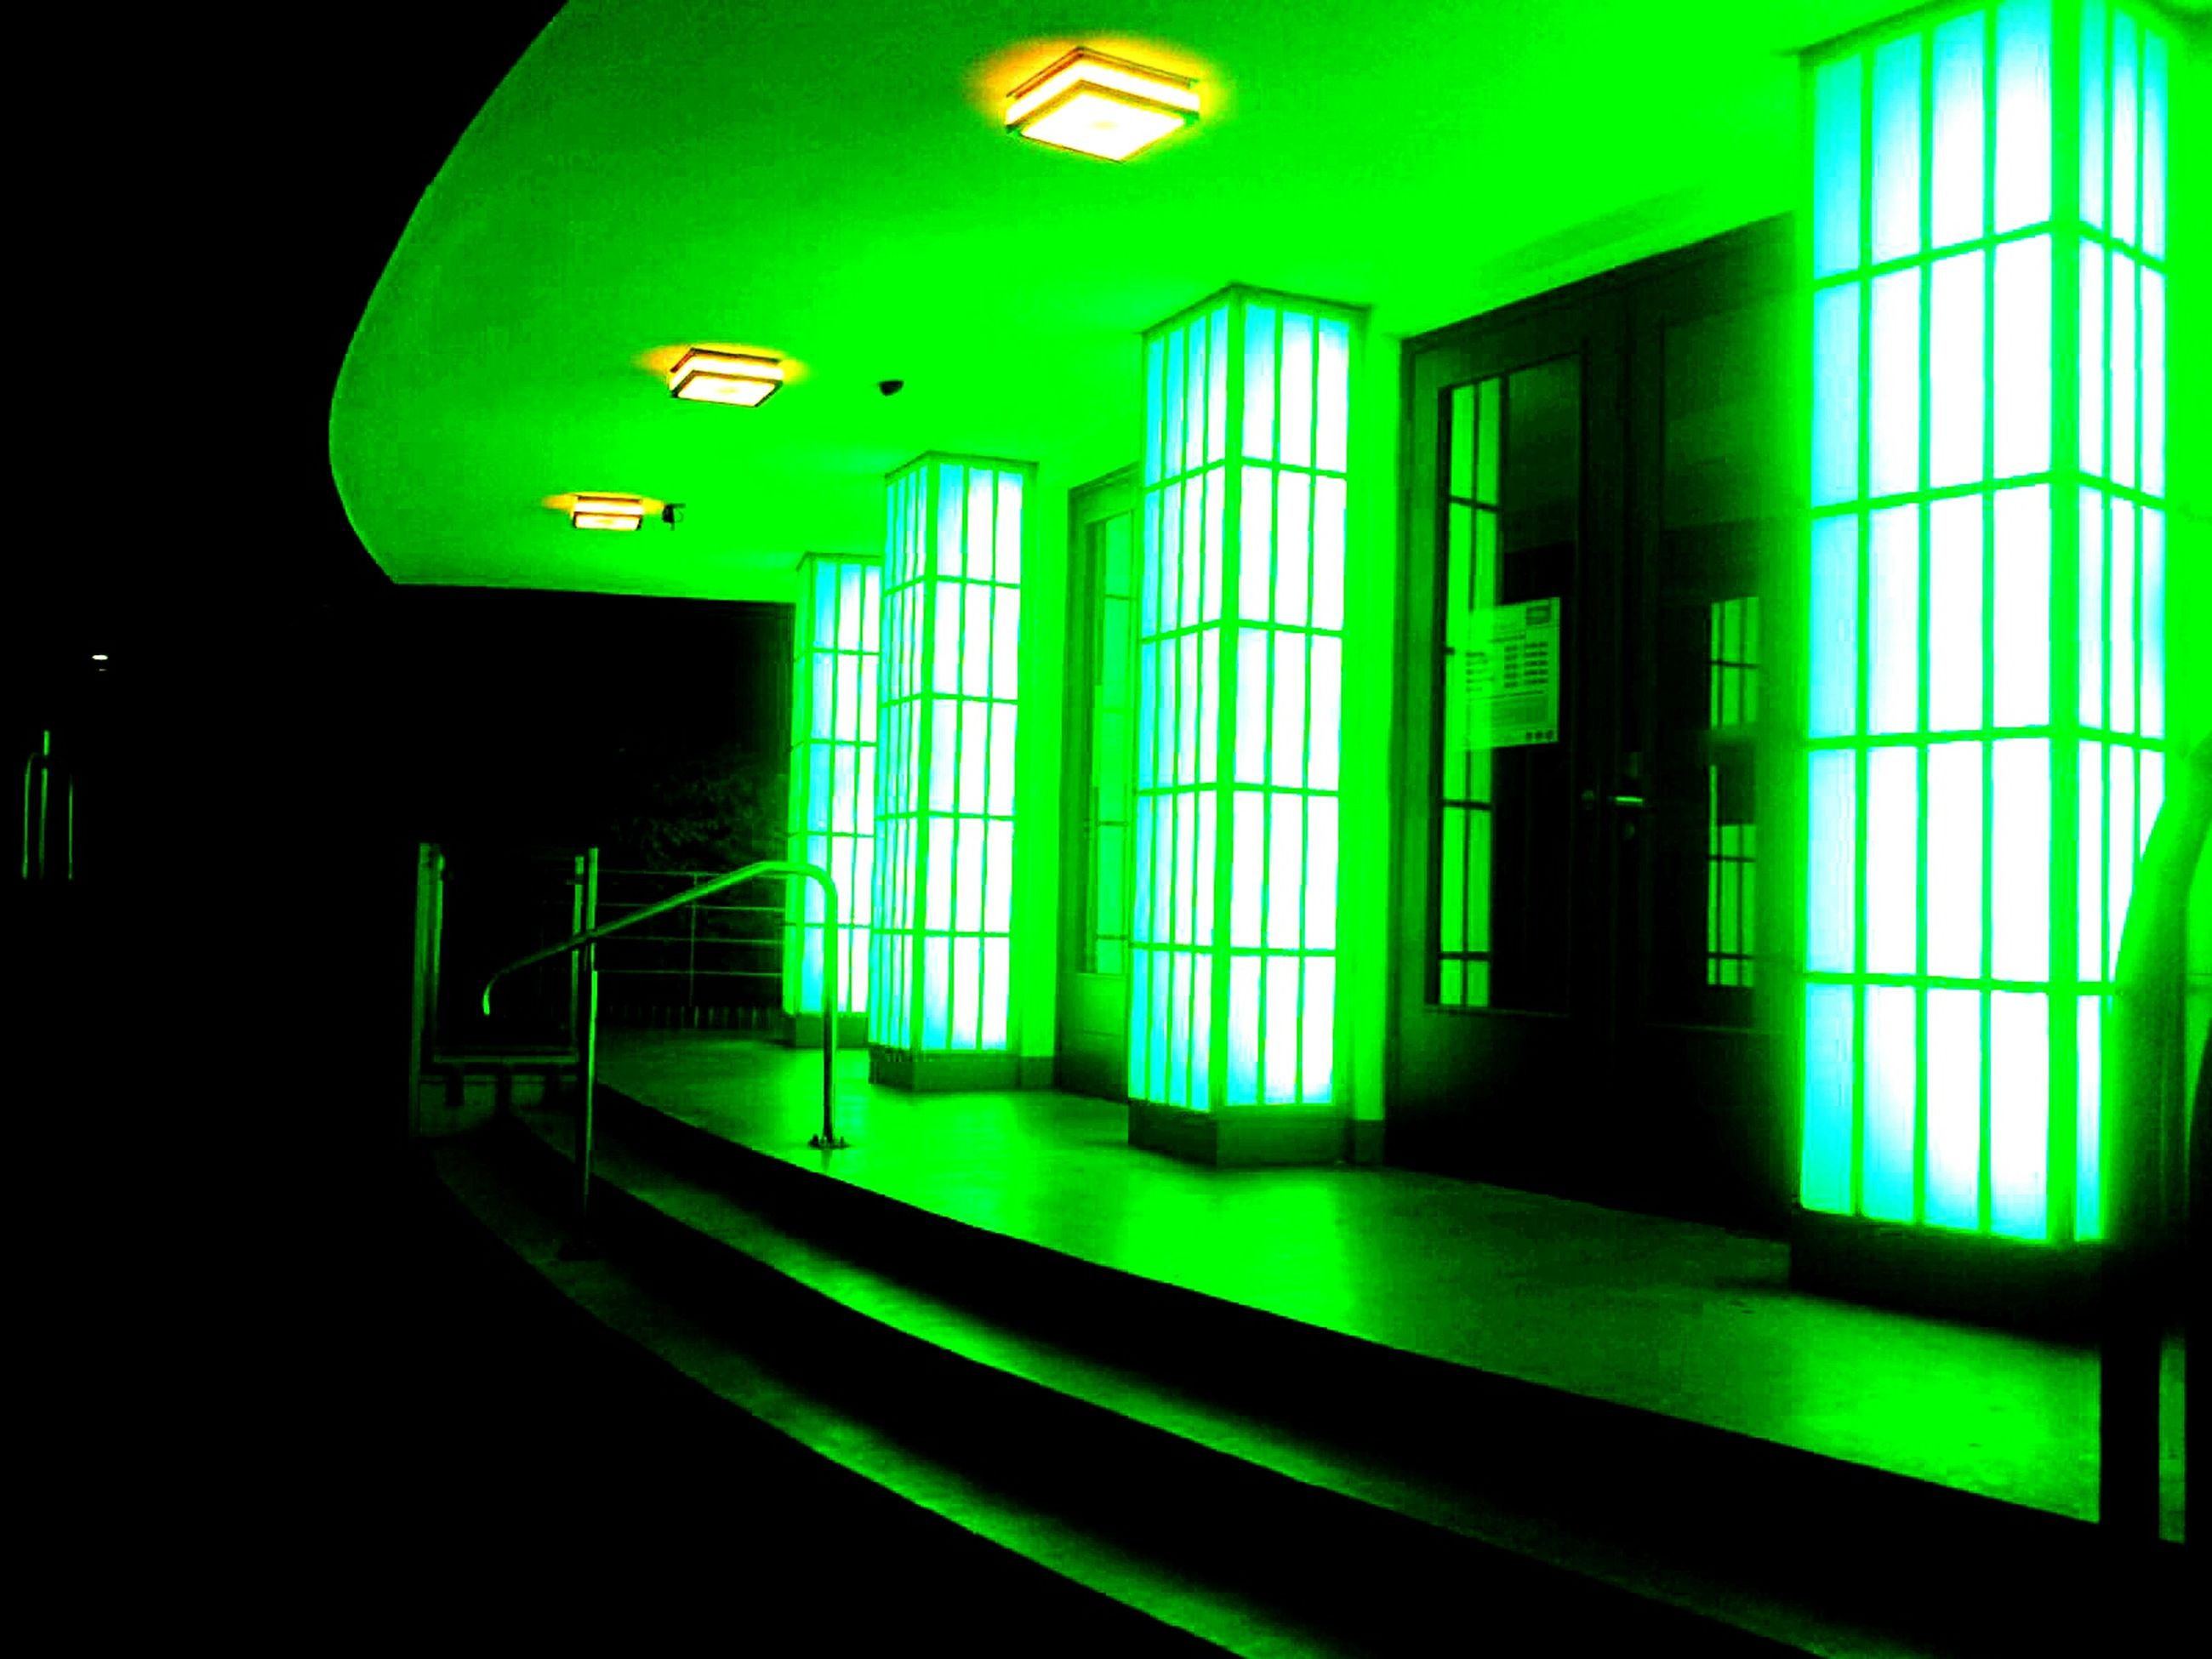 window, lighting equipment, green color, illuminated, indoors, home interior, flooring, corridor, back lit, electric light, multi colored, green, vibrant color, geometric shape, interior design